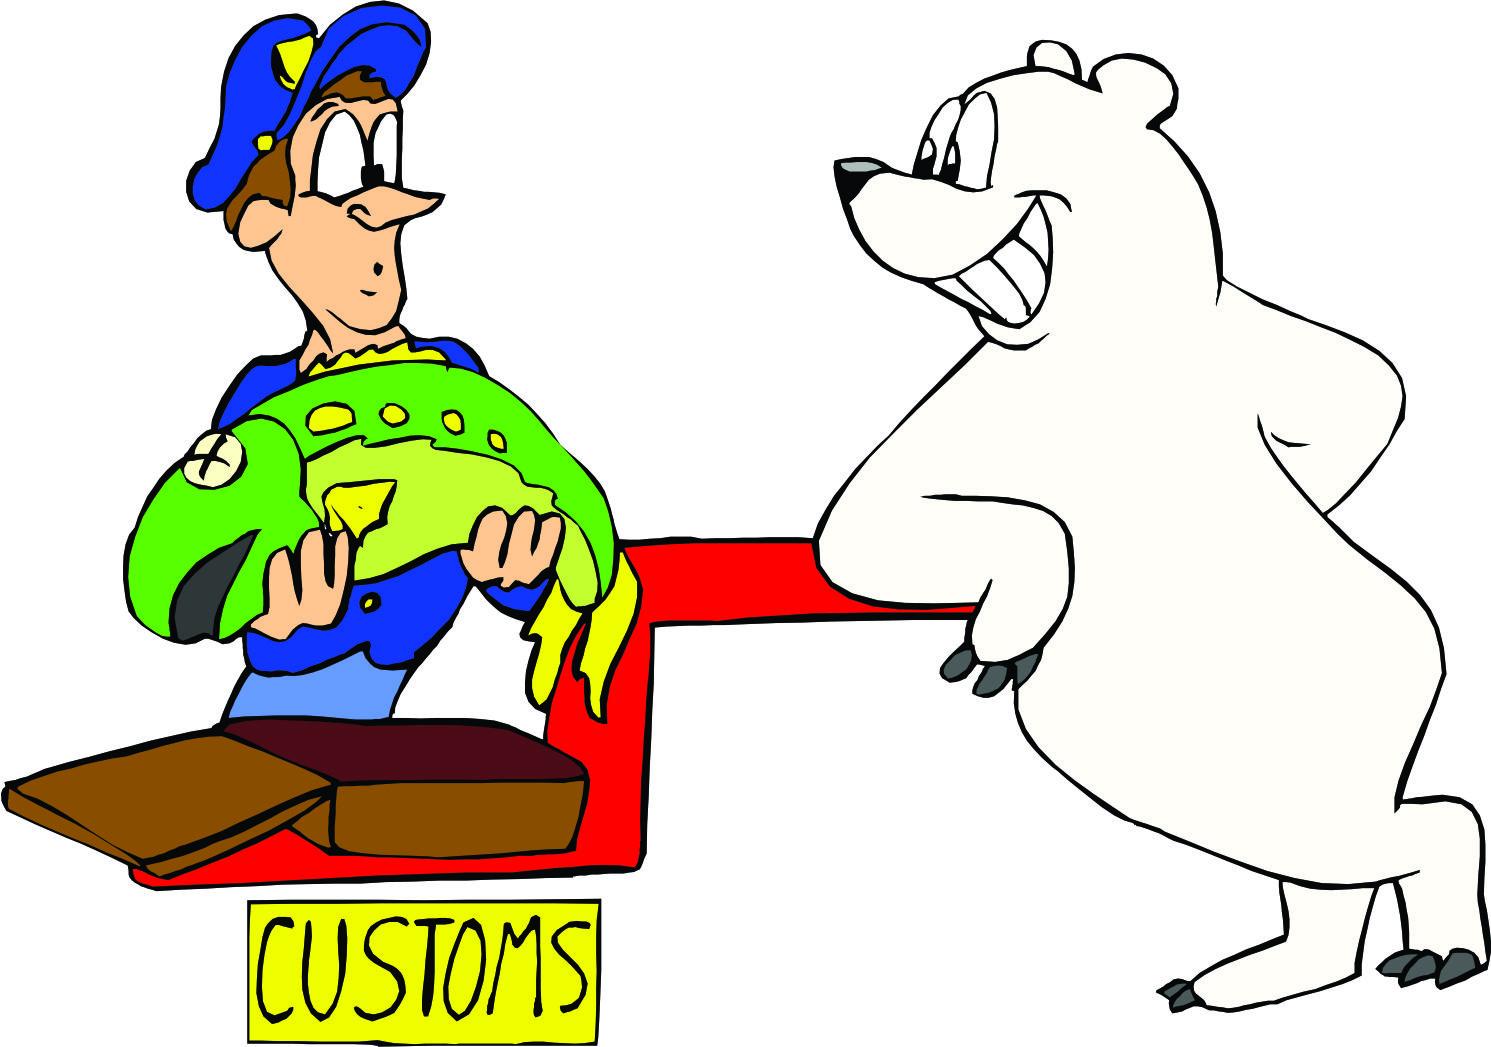 Customs clipart.